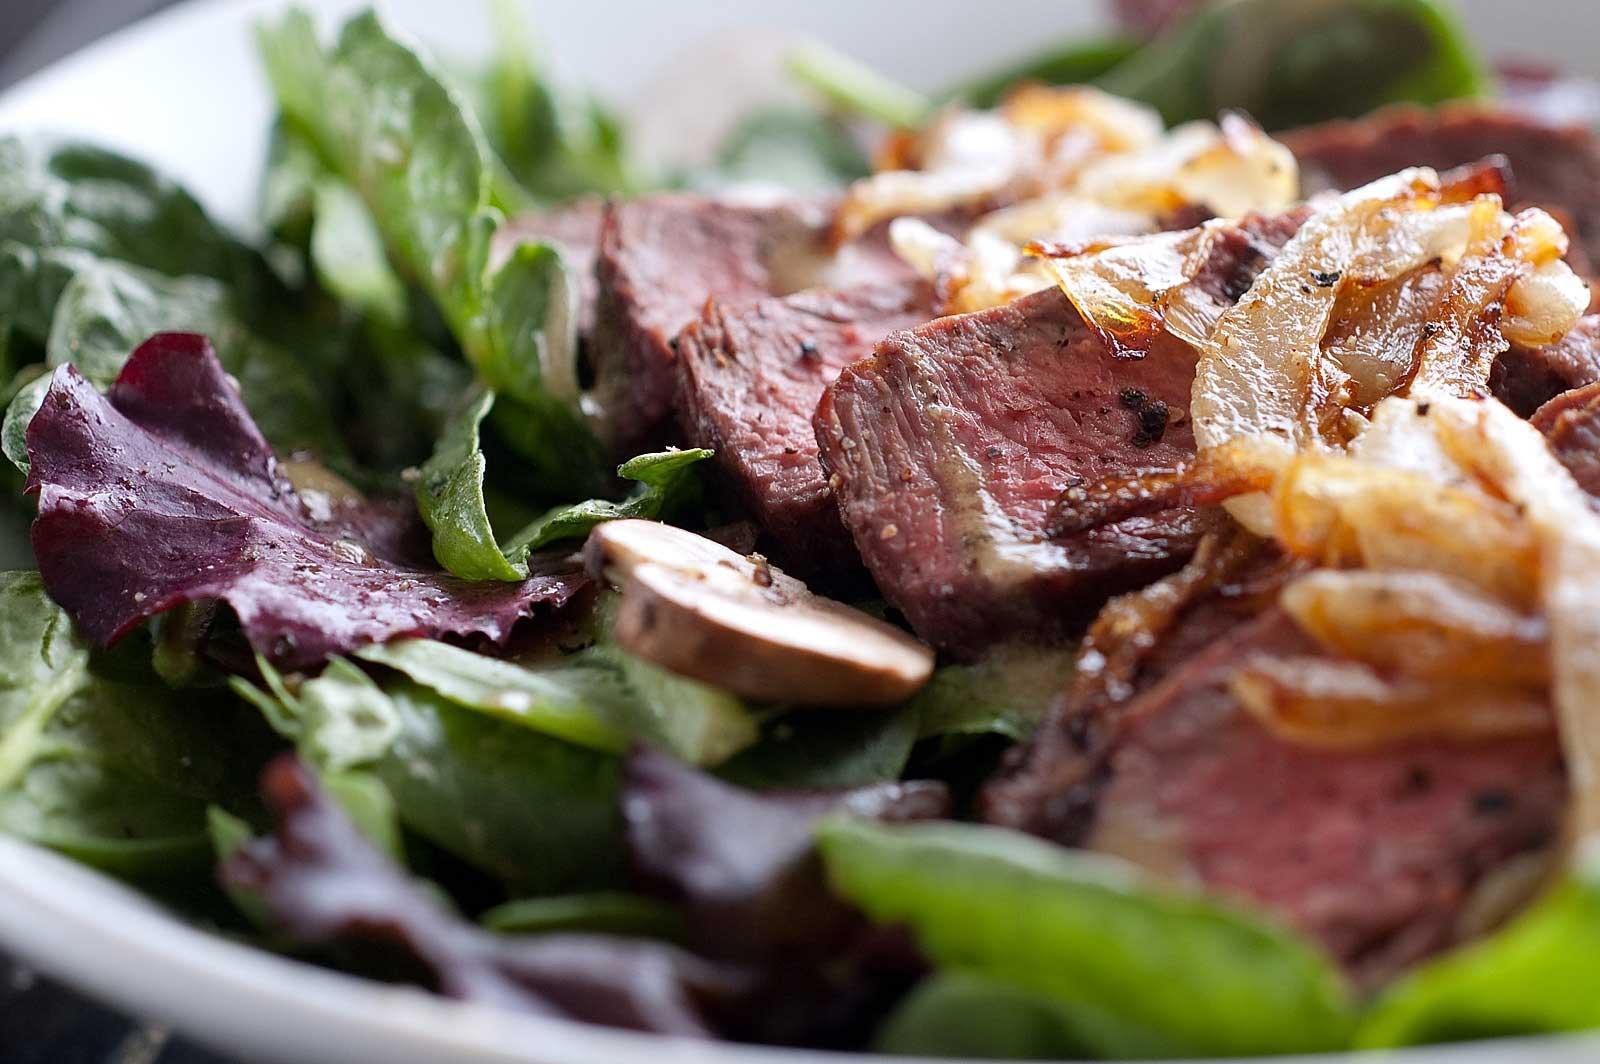 Recipe for Grilled Steak Salad with Dijon Vinaigrette - Life's ...